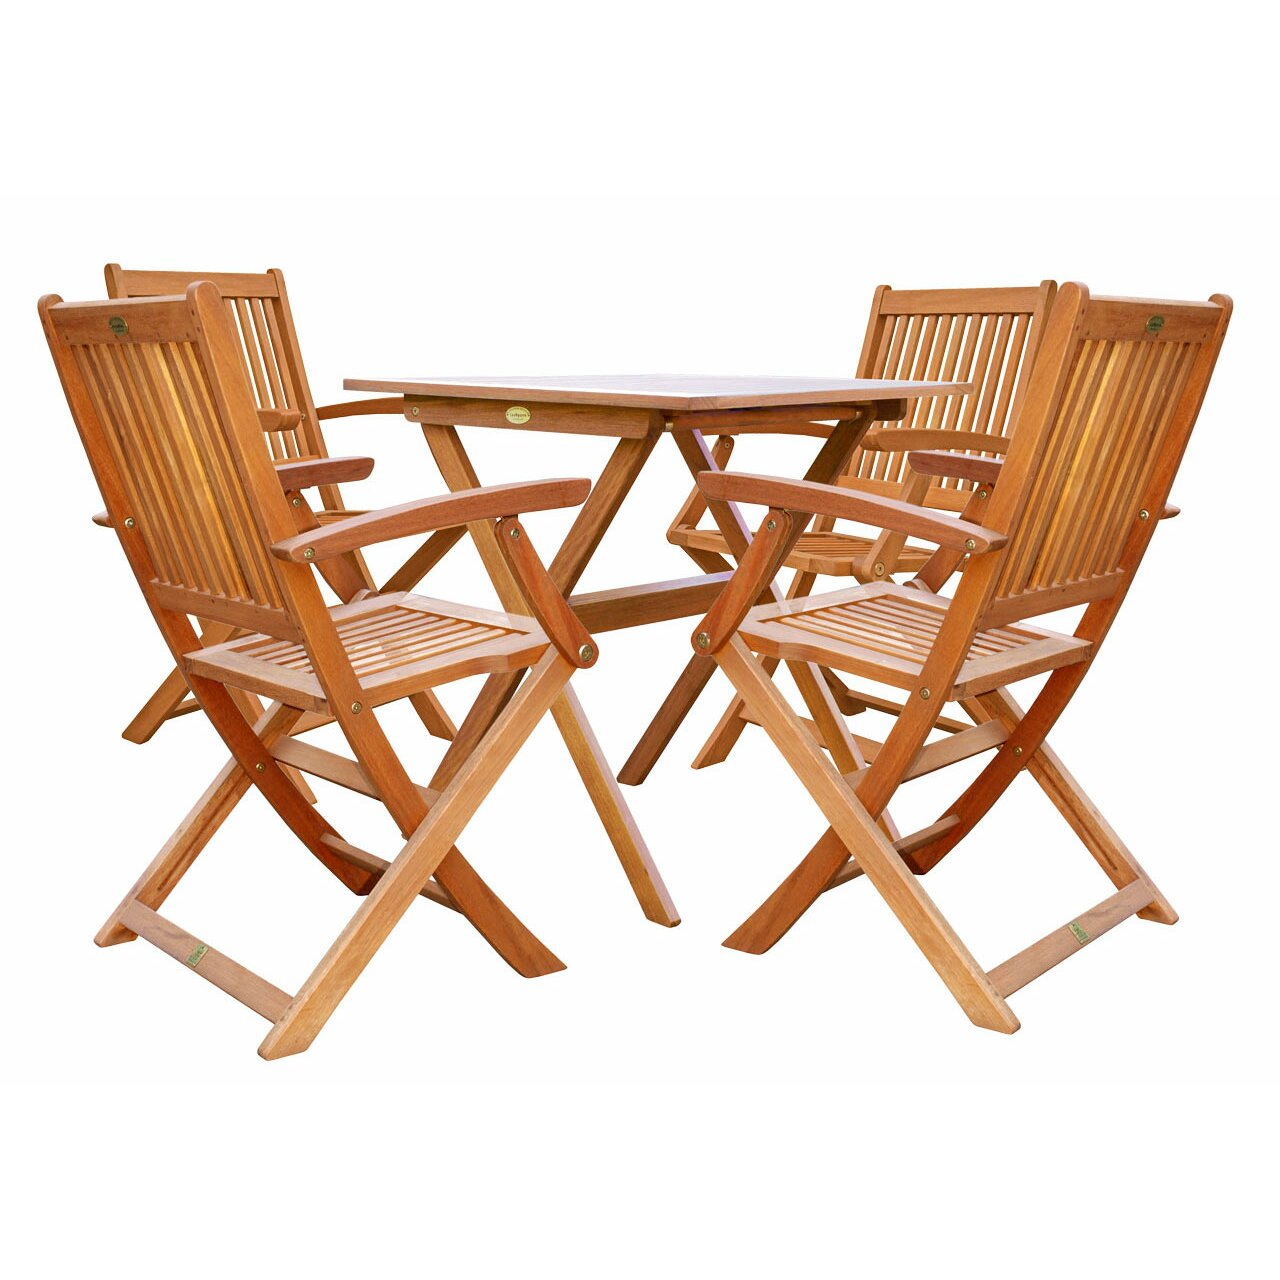 alkbrands luunguyen win 5 piece folding bistro dining set. Black Bedroom Furniture Sets. Home Design Ideas